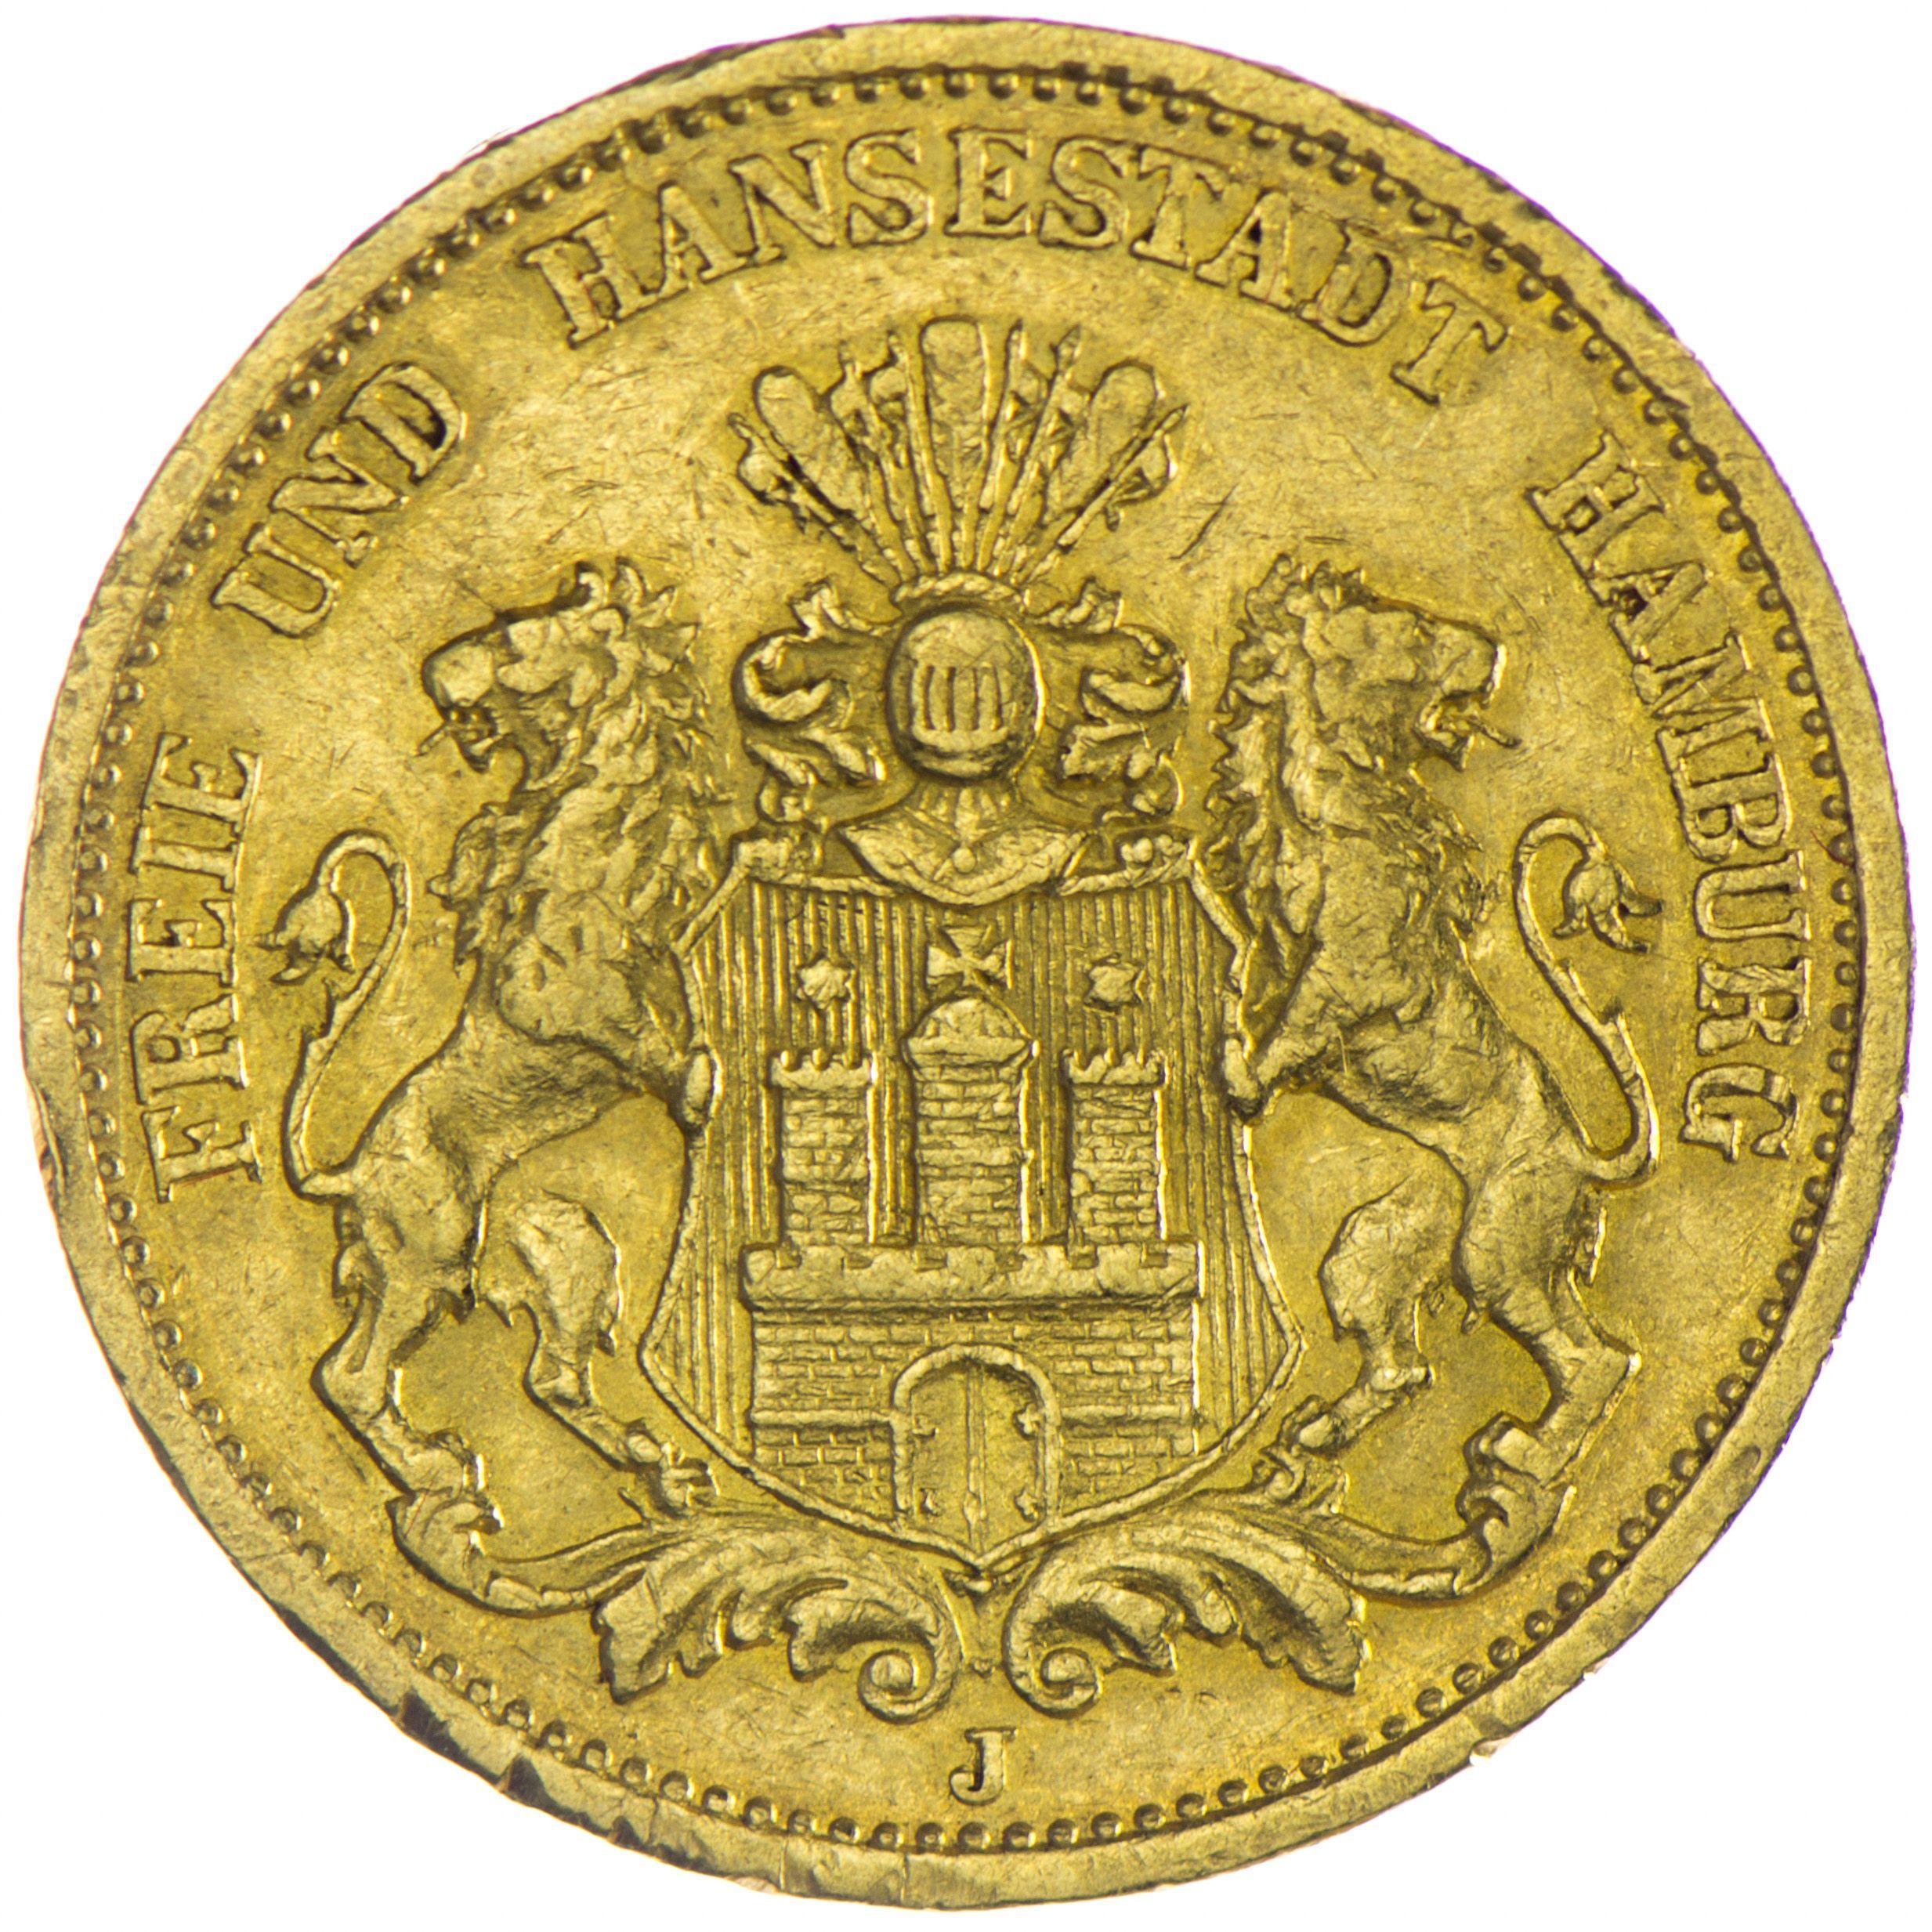 Hamburg 20 Mark 1878 J Gold Gold and silver coins, Gold